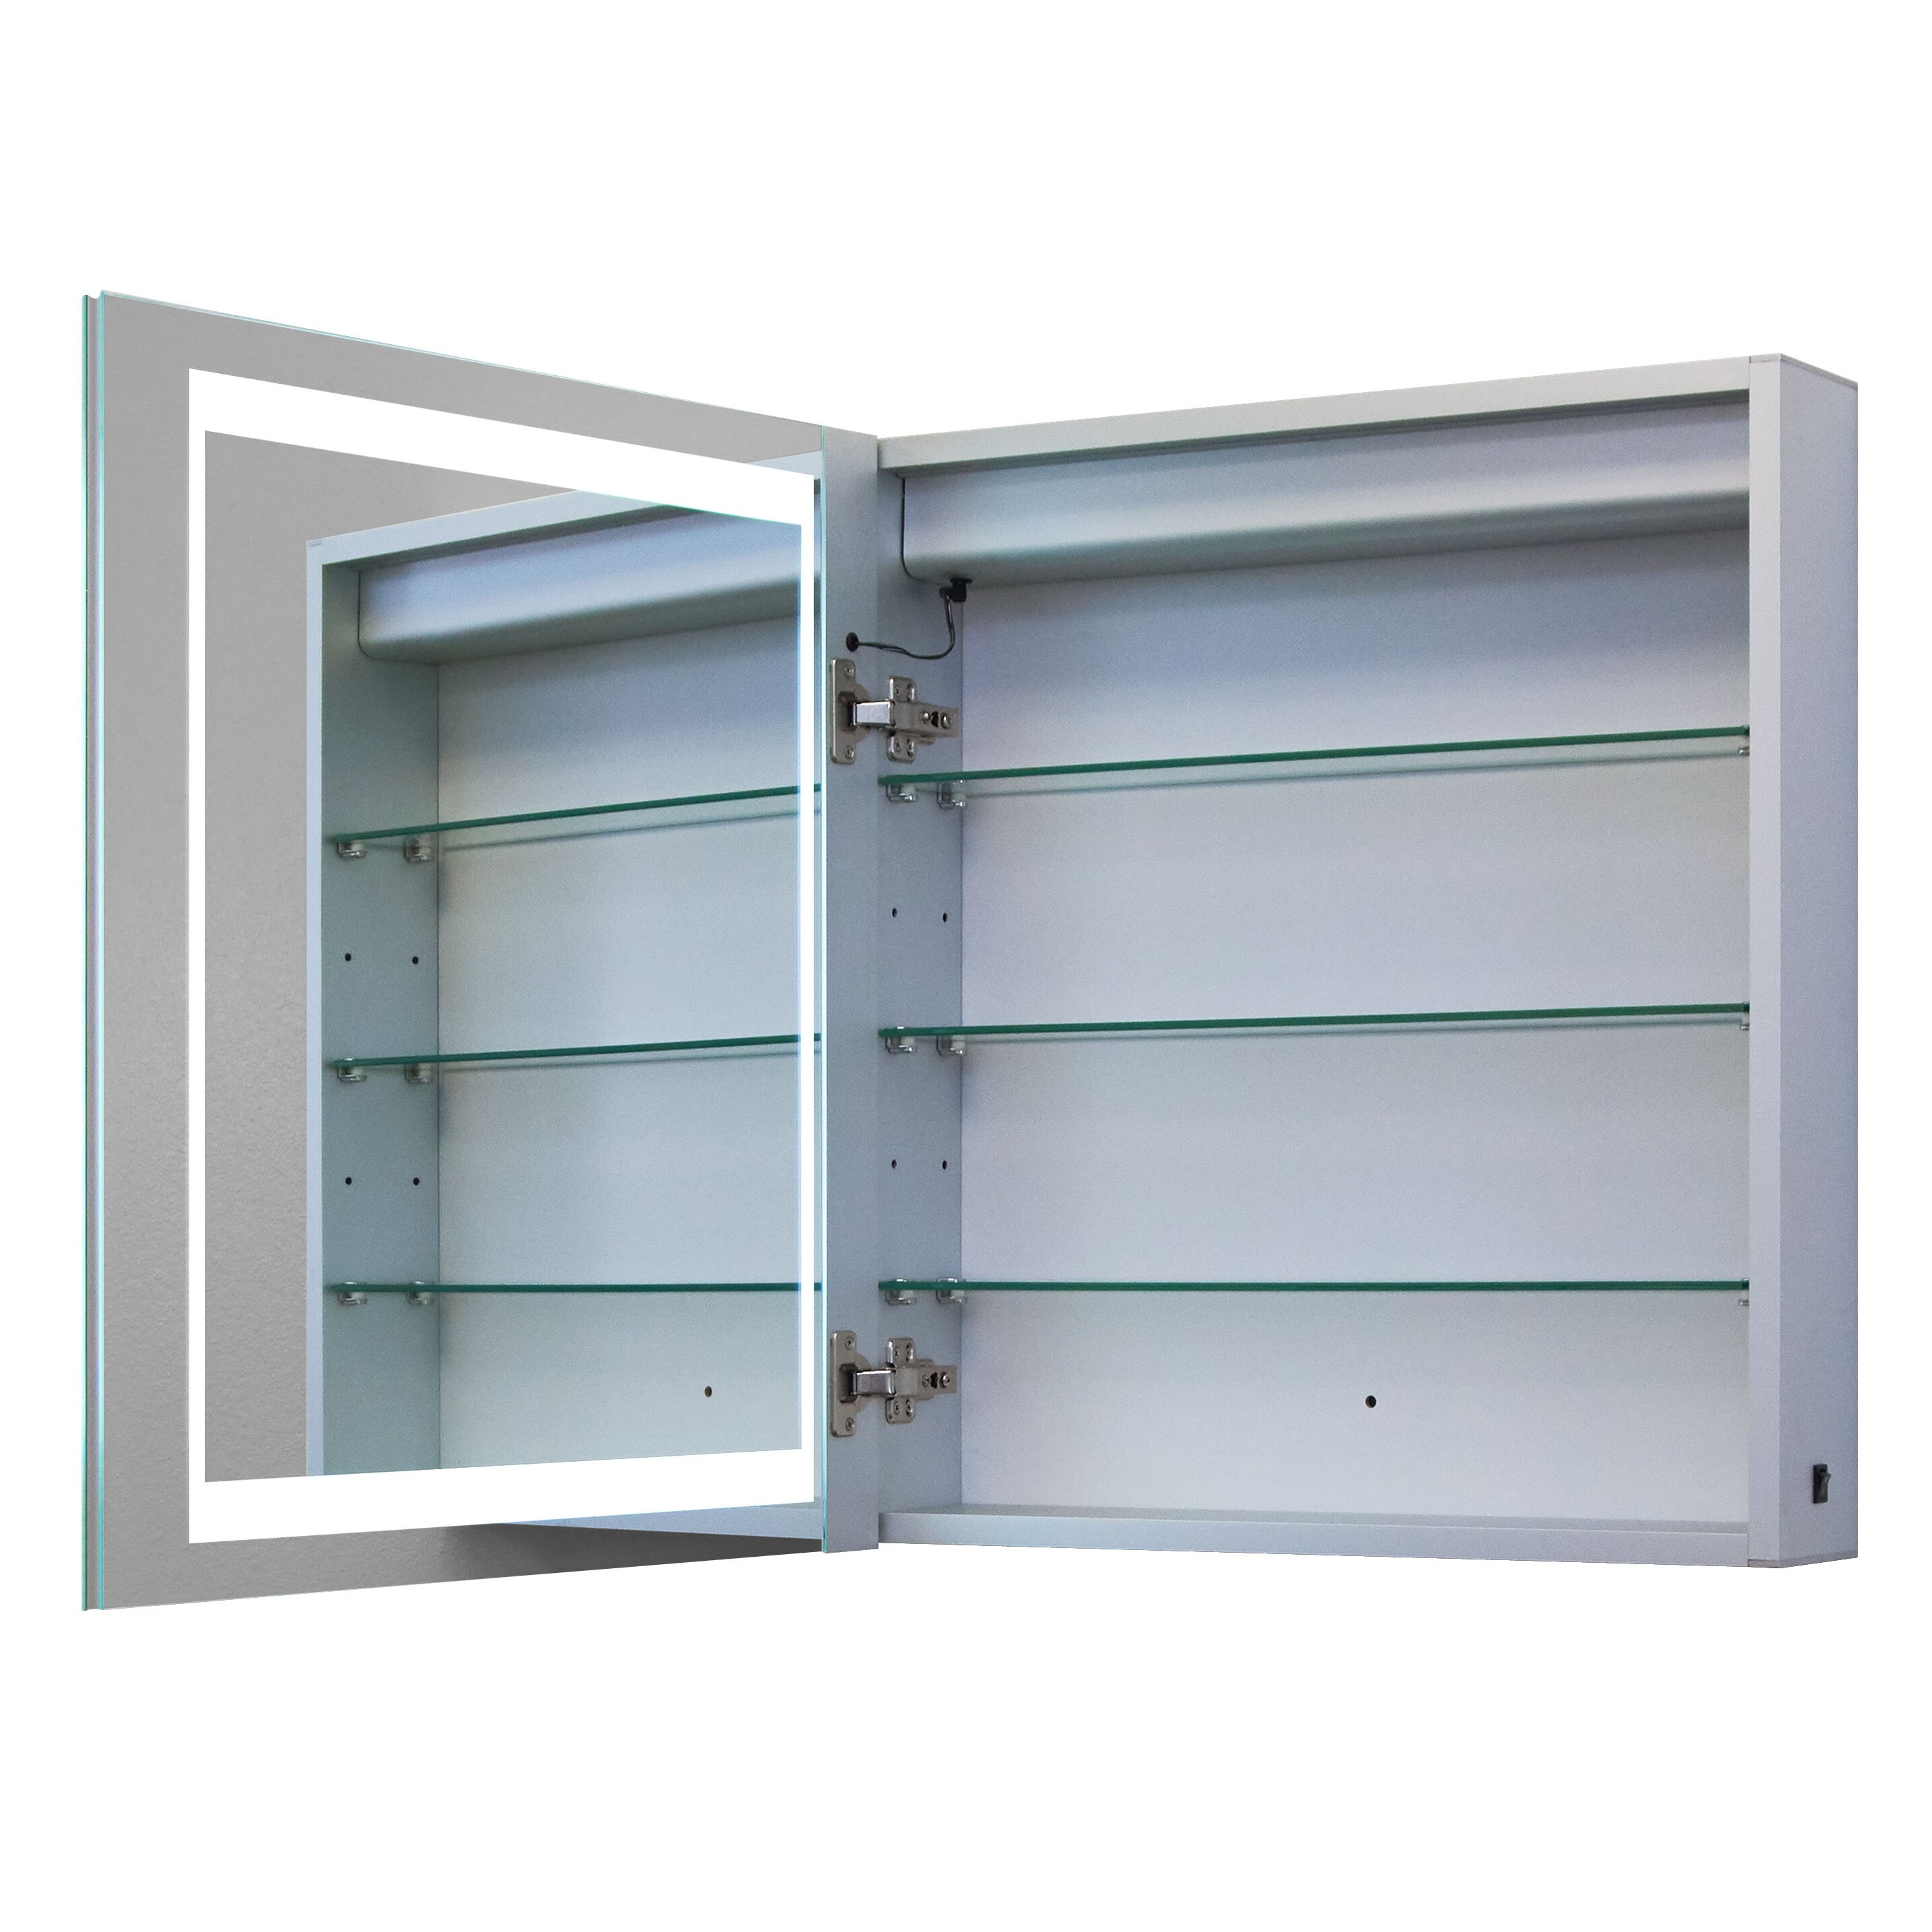 Innoci Illumirror 24 X 26 Surface Mount Medicine Cabinet